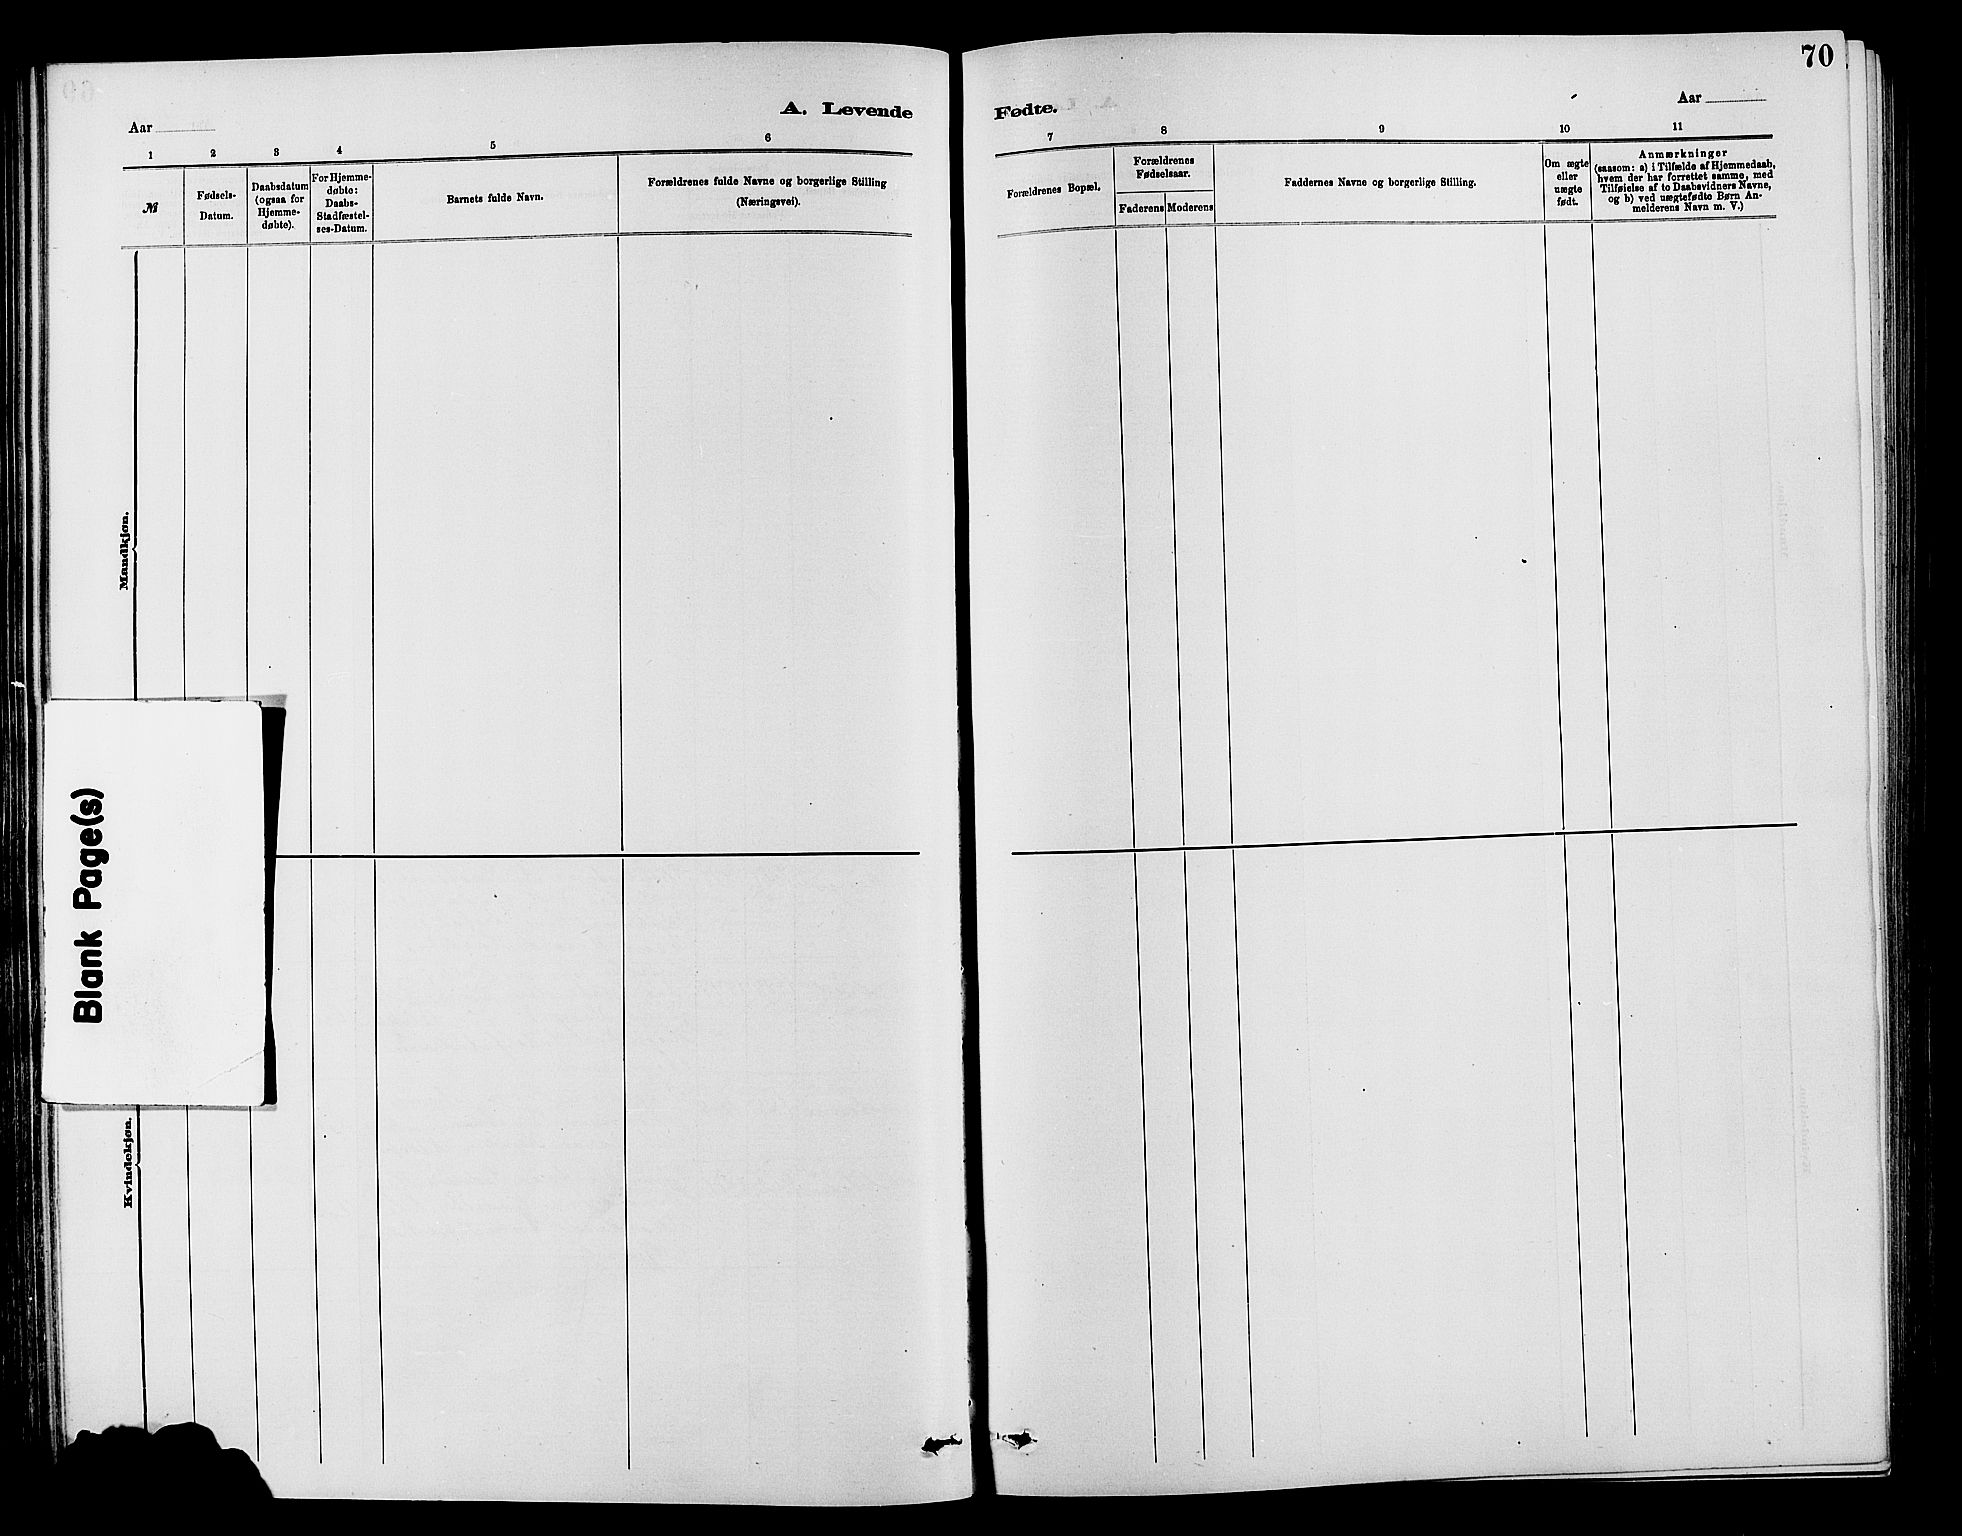 SAH, Vardal prestekontor, H/Ha/Hab/L0007: Klokkerbok nr. 7 /1, 1881-1895, s. 70